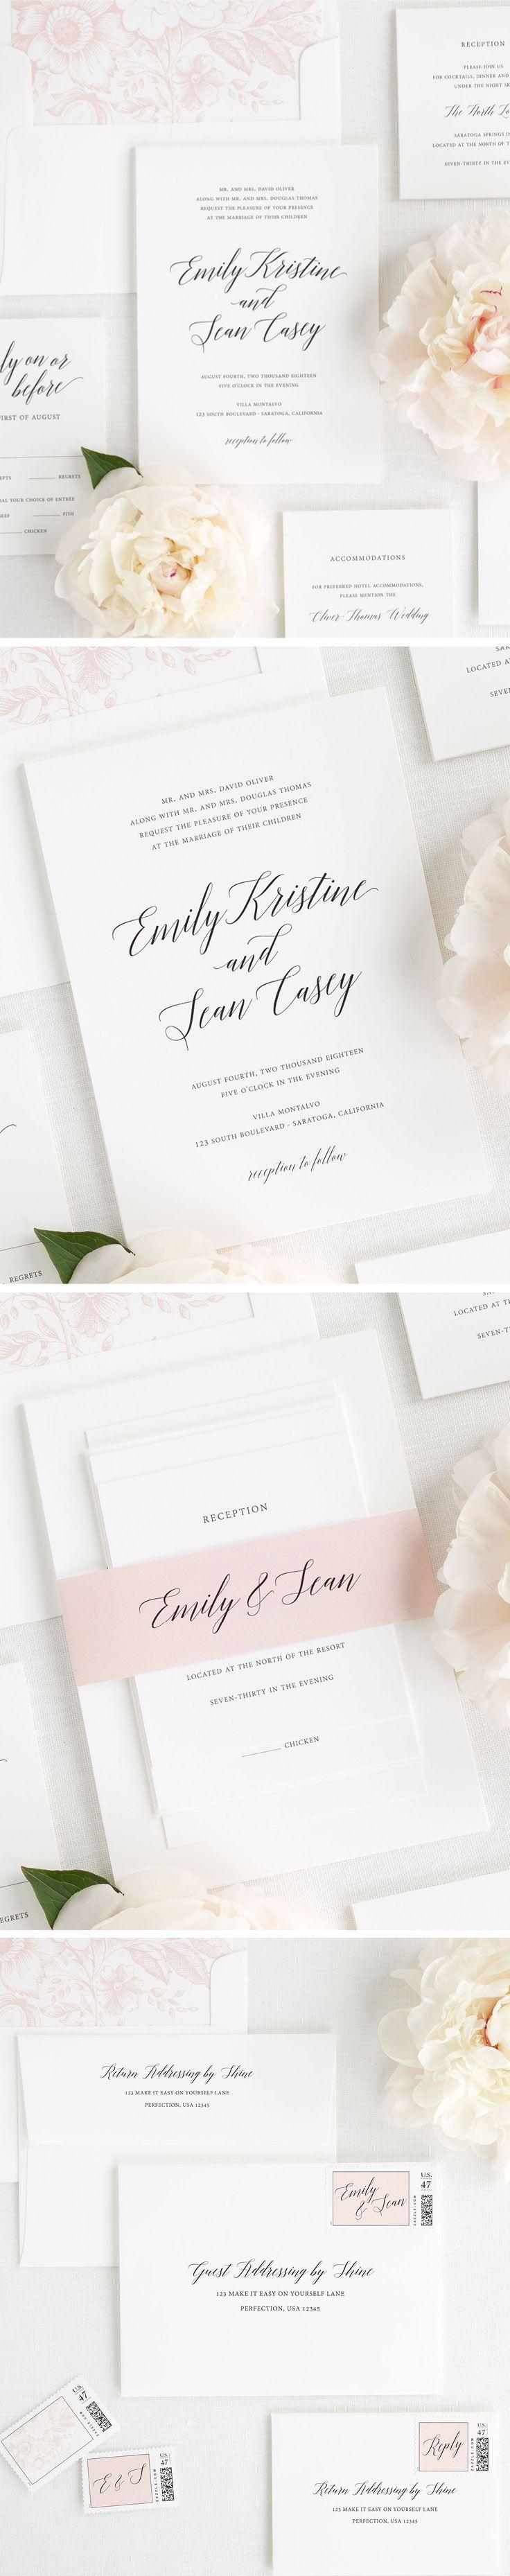 Garden Romance Wedding Invitations | Modern calligraphy, Classic ...